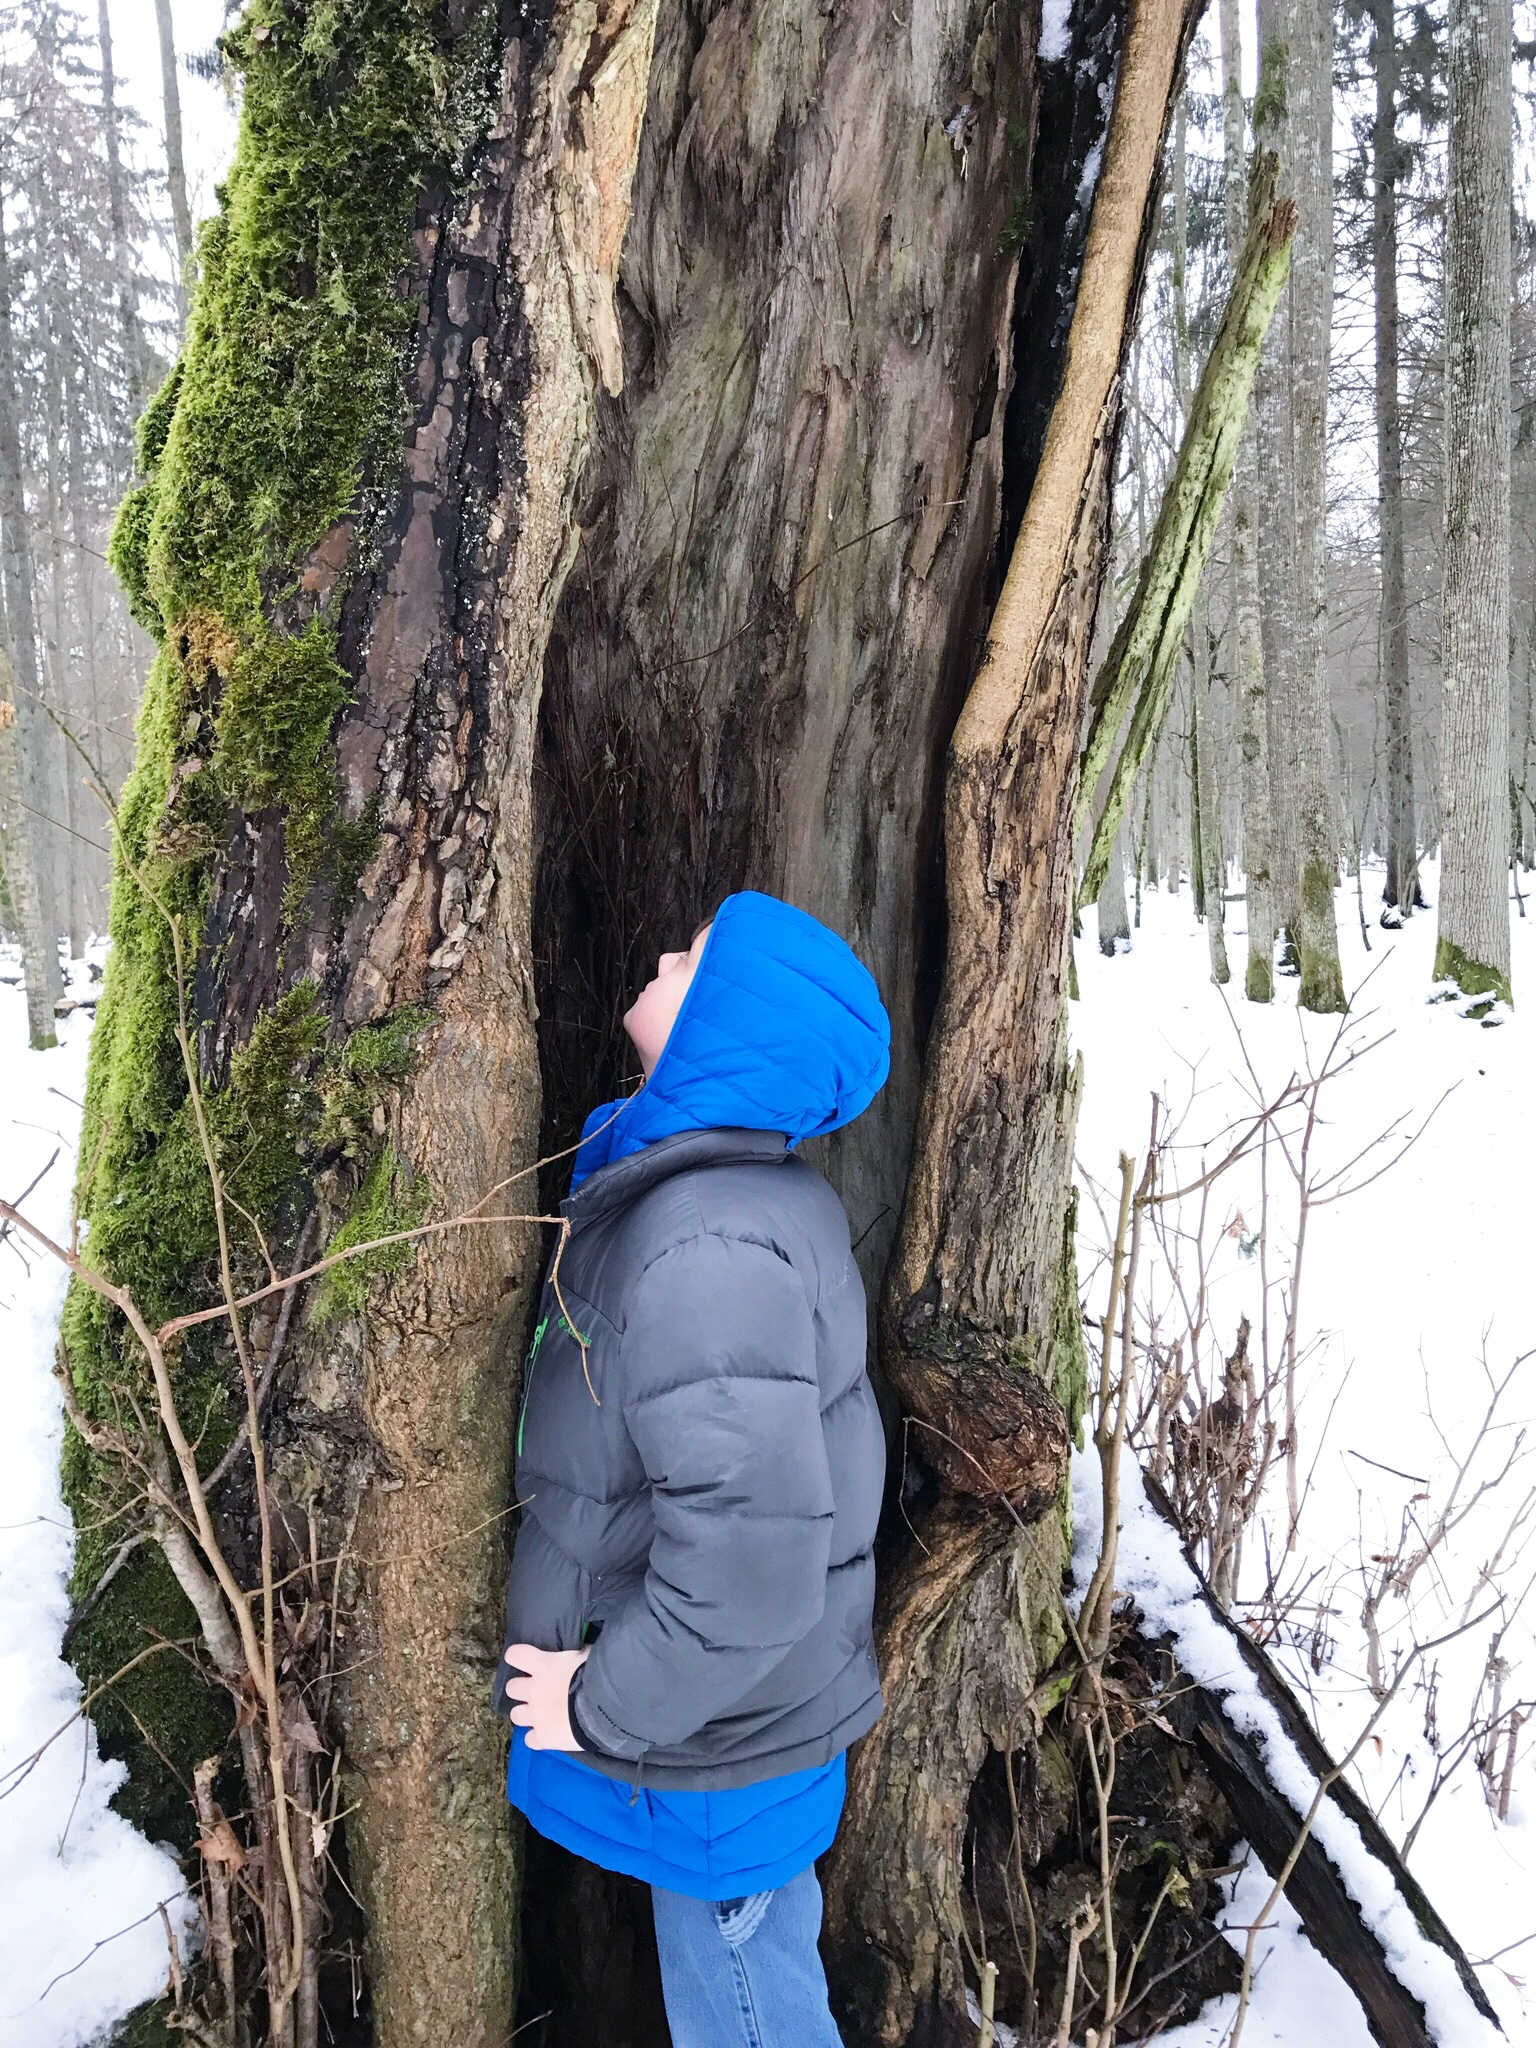 exploring-trees-bialowieza-forest.jpg